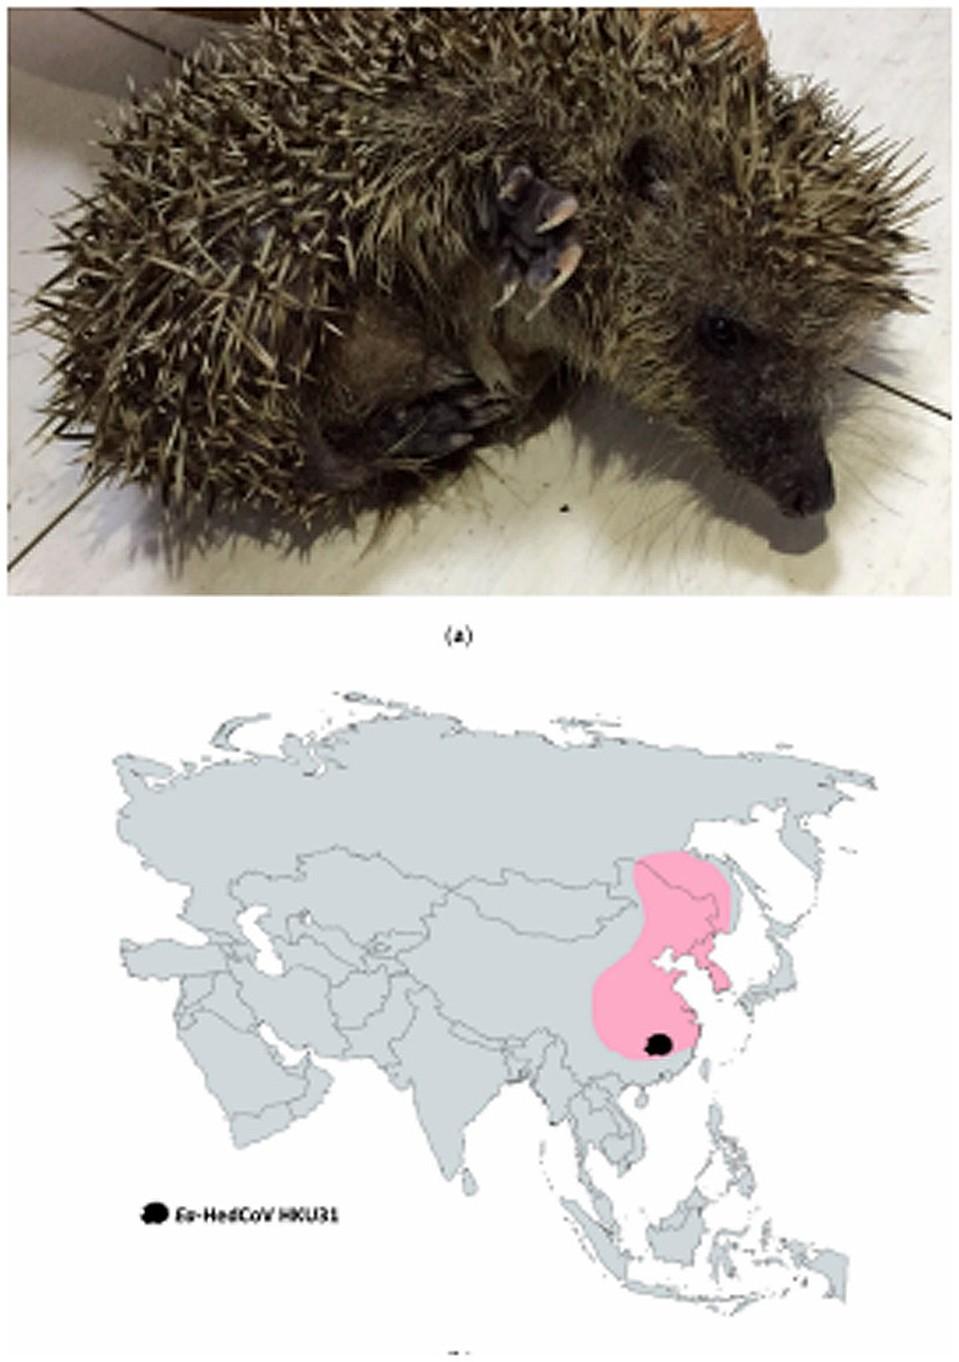 На карте показан ареал амурского ежа, у которого был обнаружен коронаровирус Ea-HedCoV HKU31